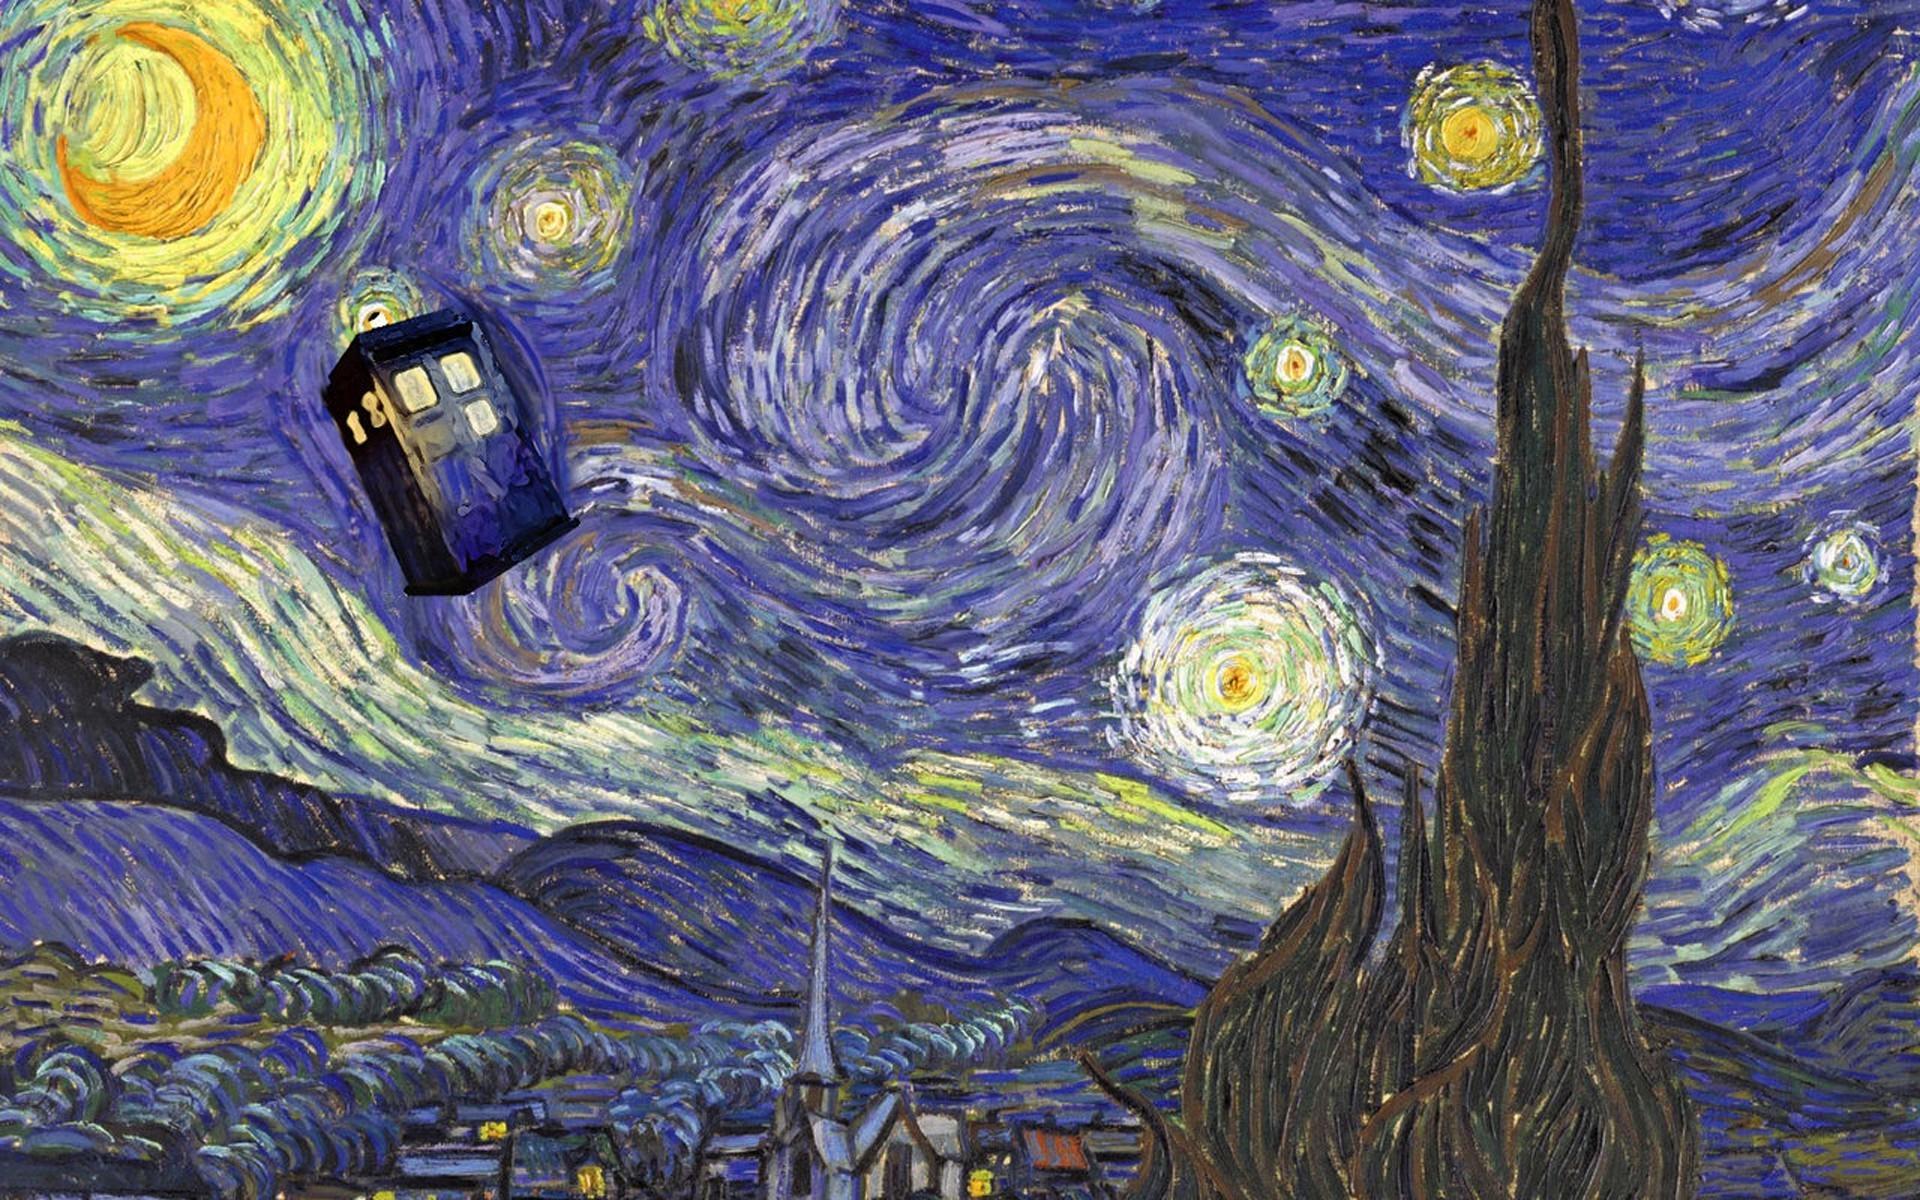 Doctor Who Desktop Wallpaper Hd: Doctor Who Tardis Desktop Wallpaper (67+ Images